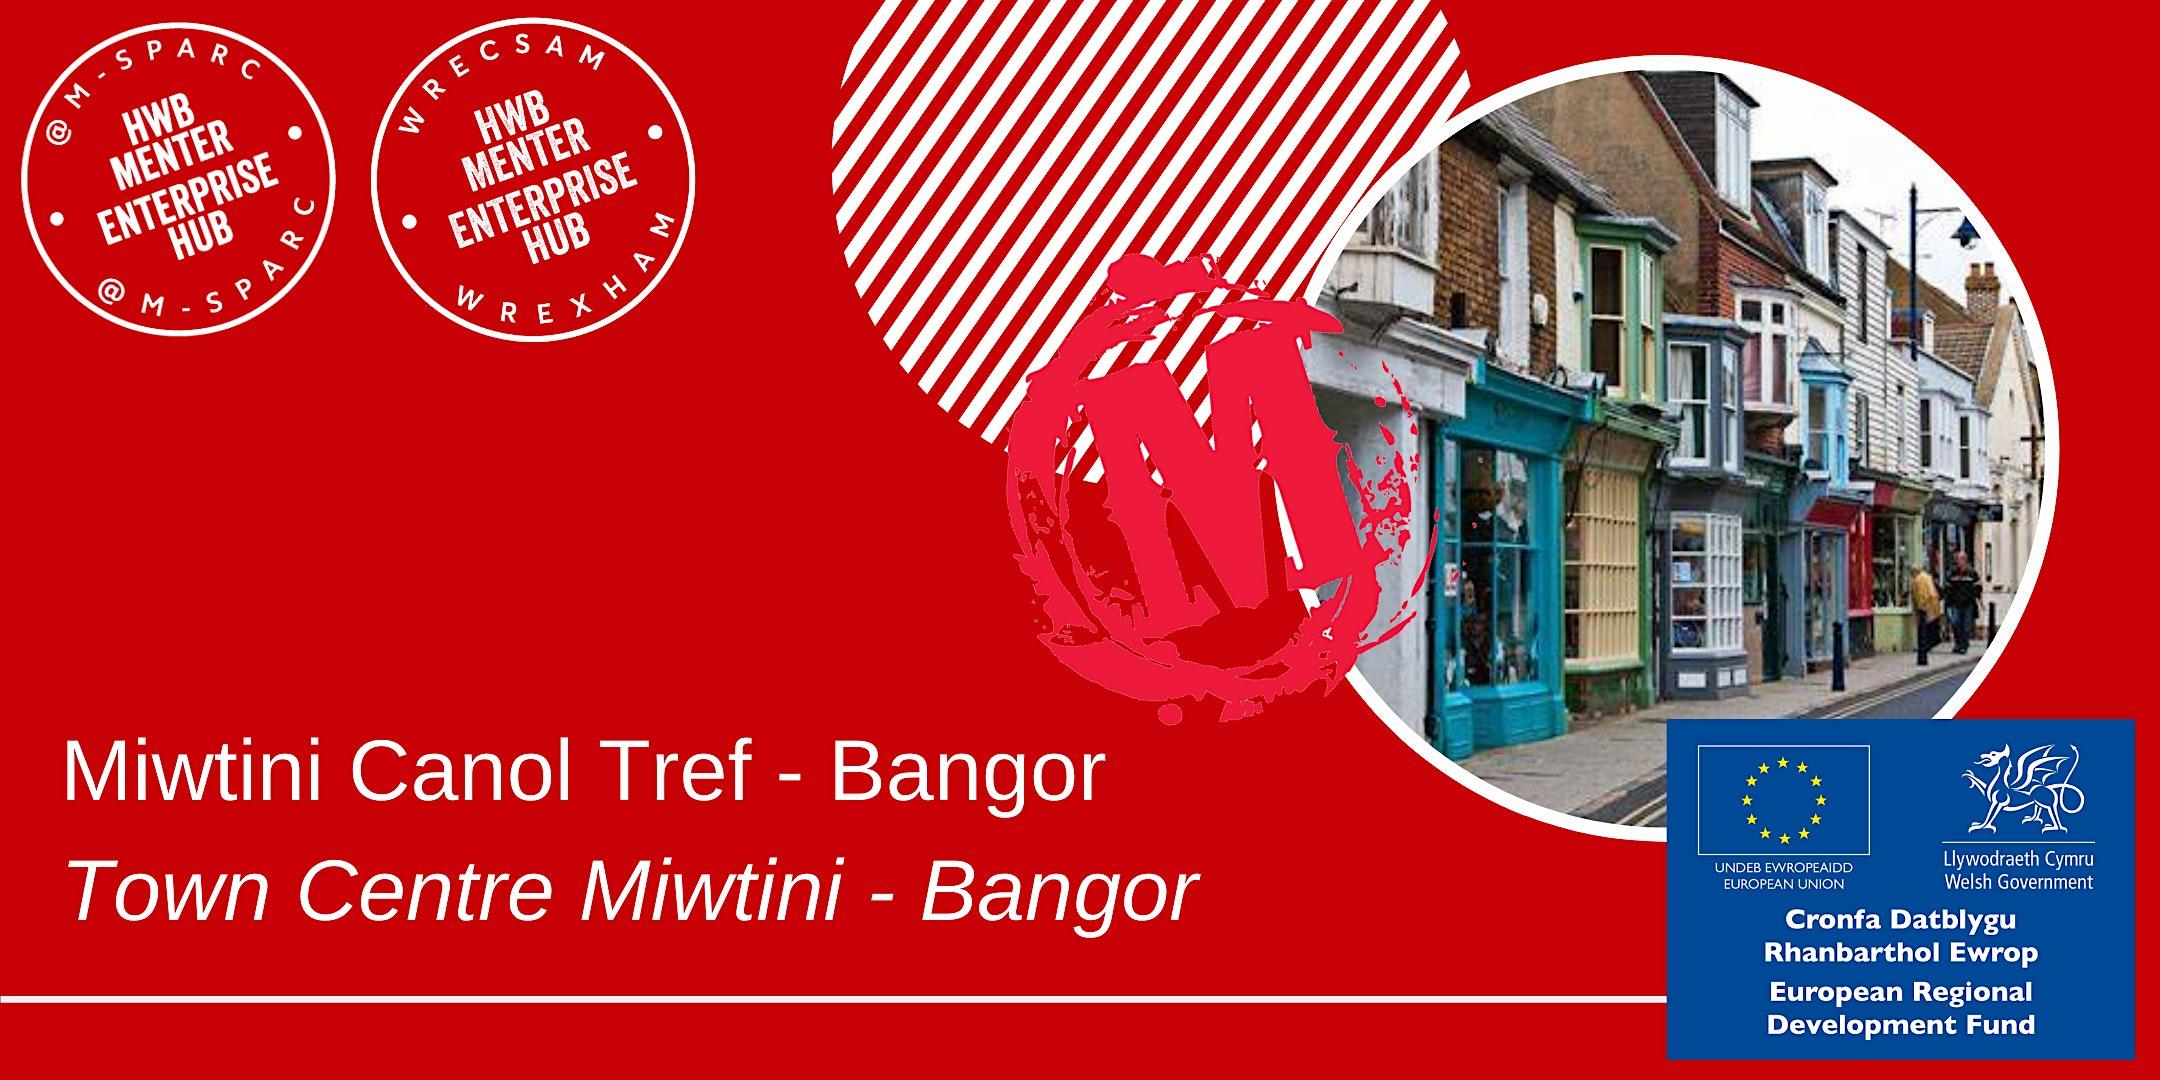 ONLINE- Miwtini Canol Tref - Bangor / Town Centre Miwtini - Bangor